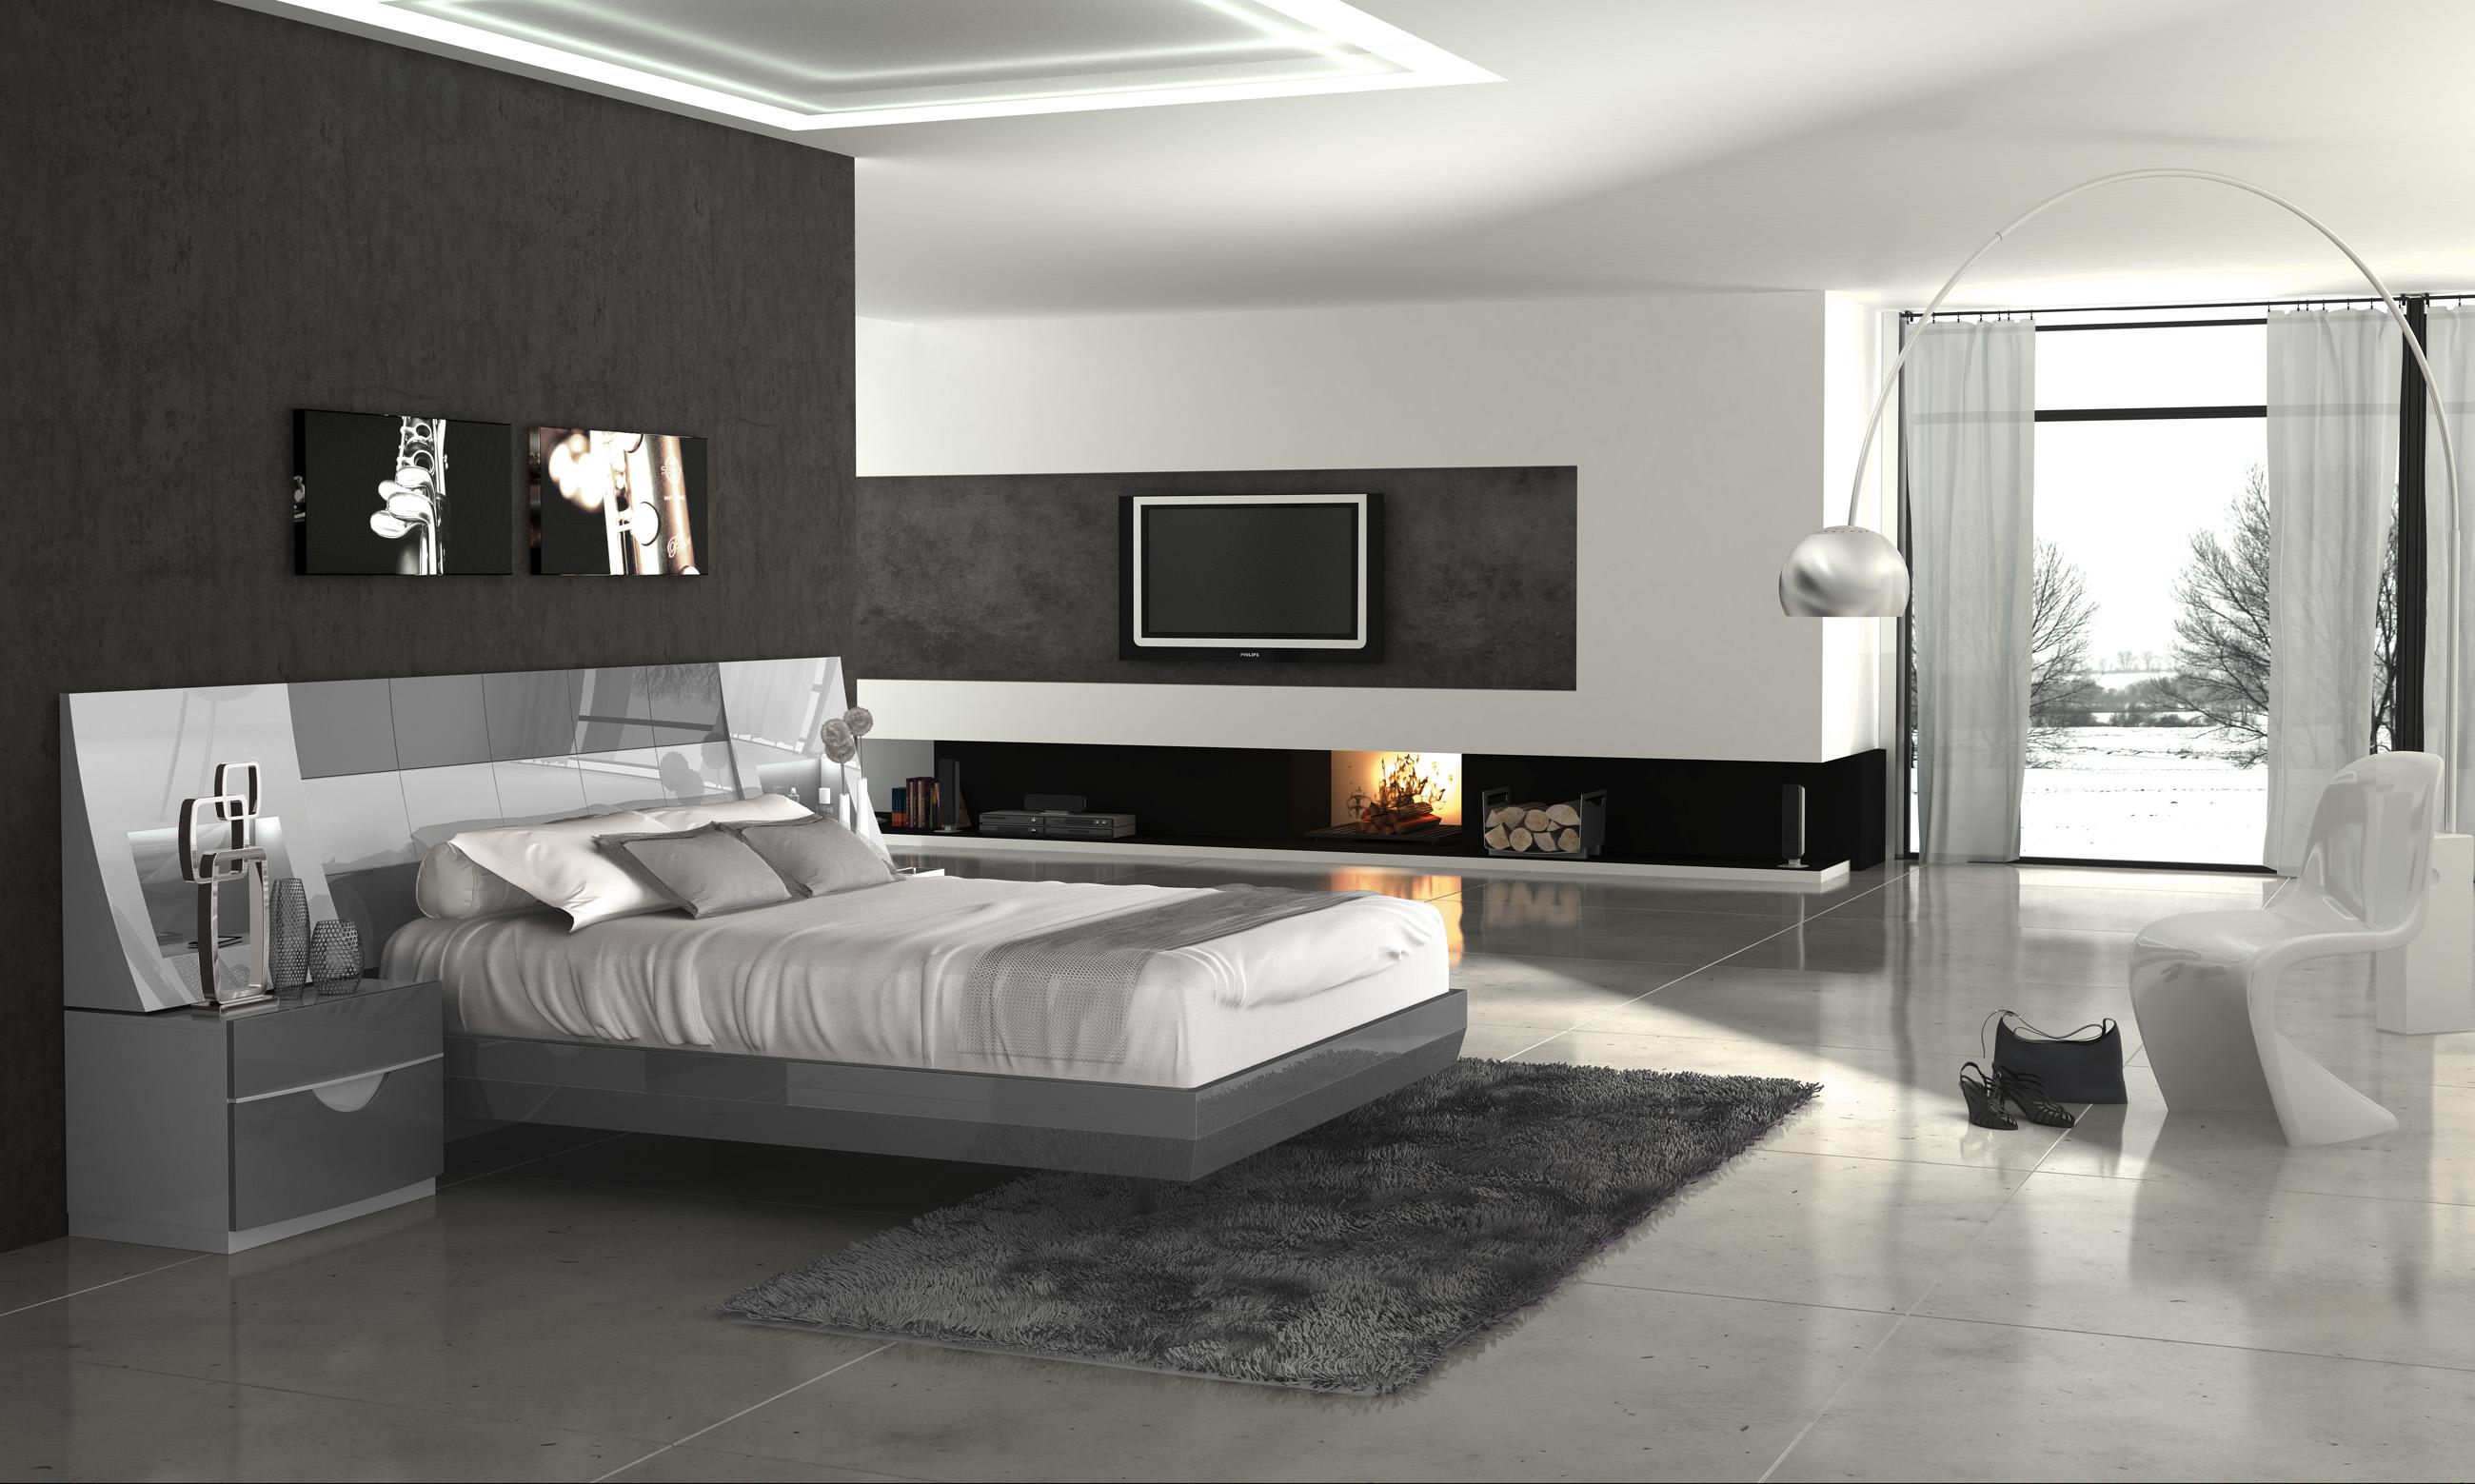 Dormitorio fenicia interiorismo dise o de dormitorios e - Replicas de muebles de diseno ...